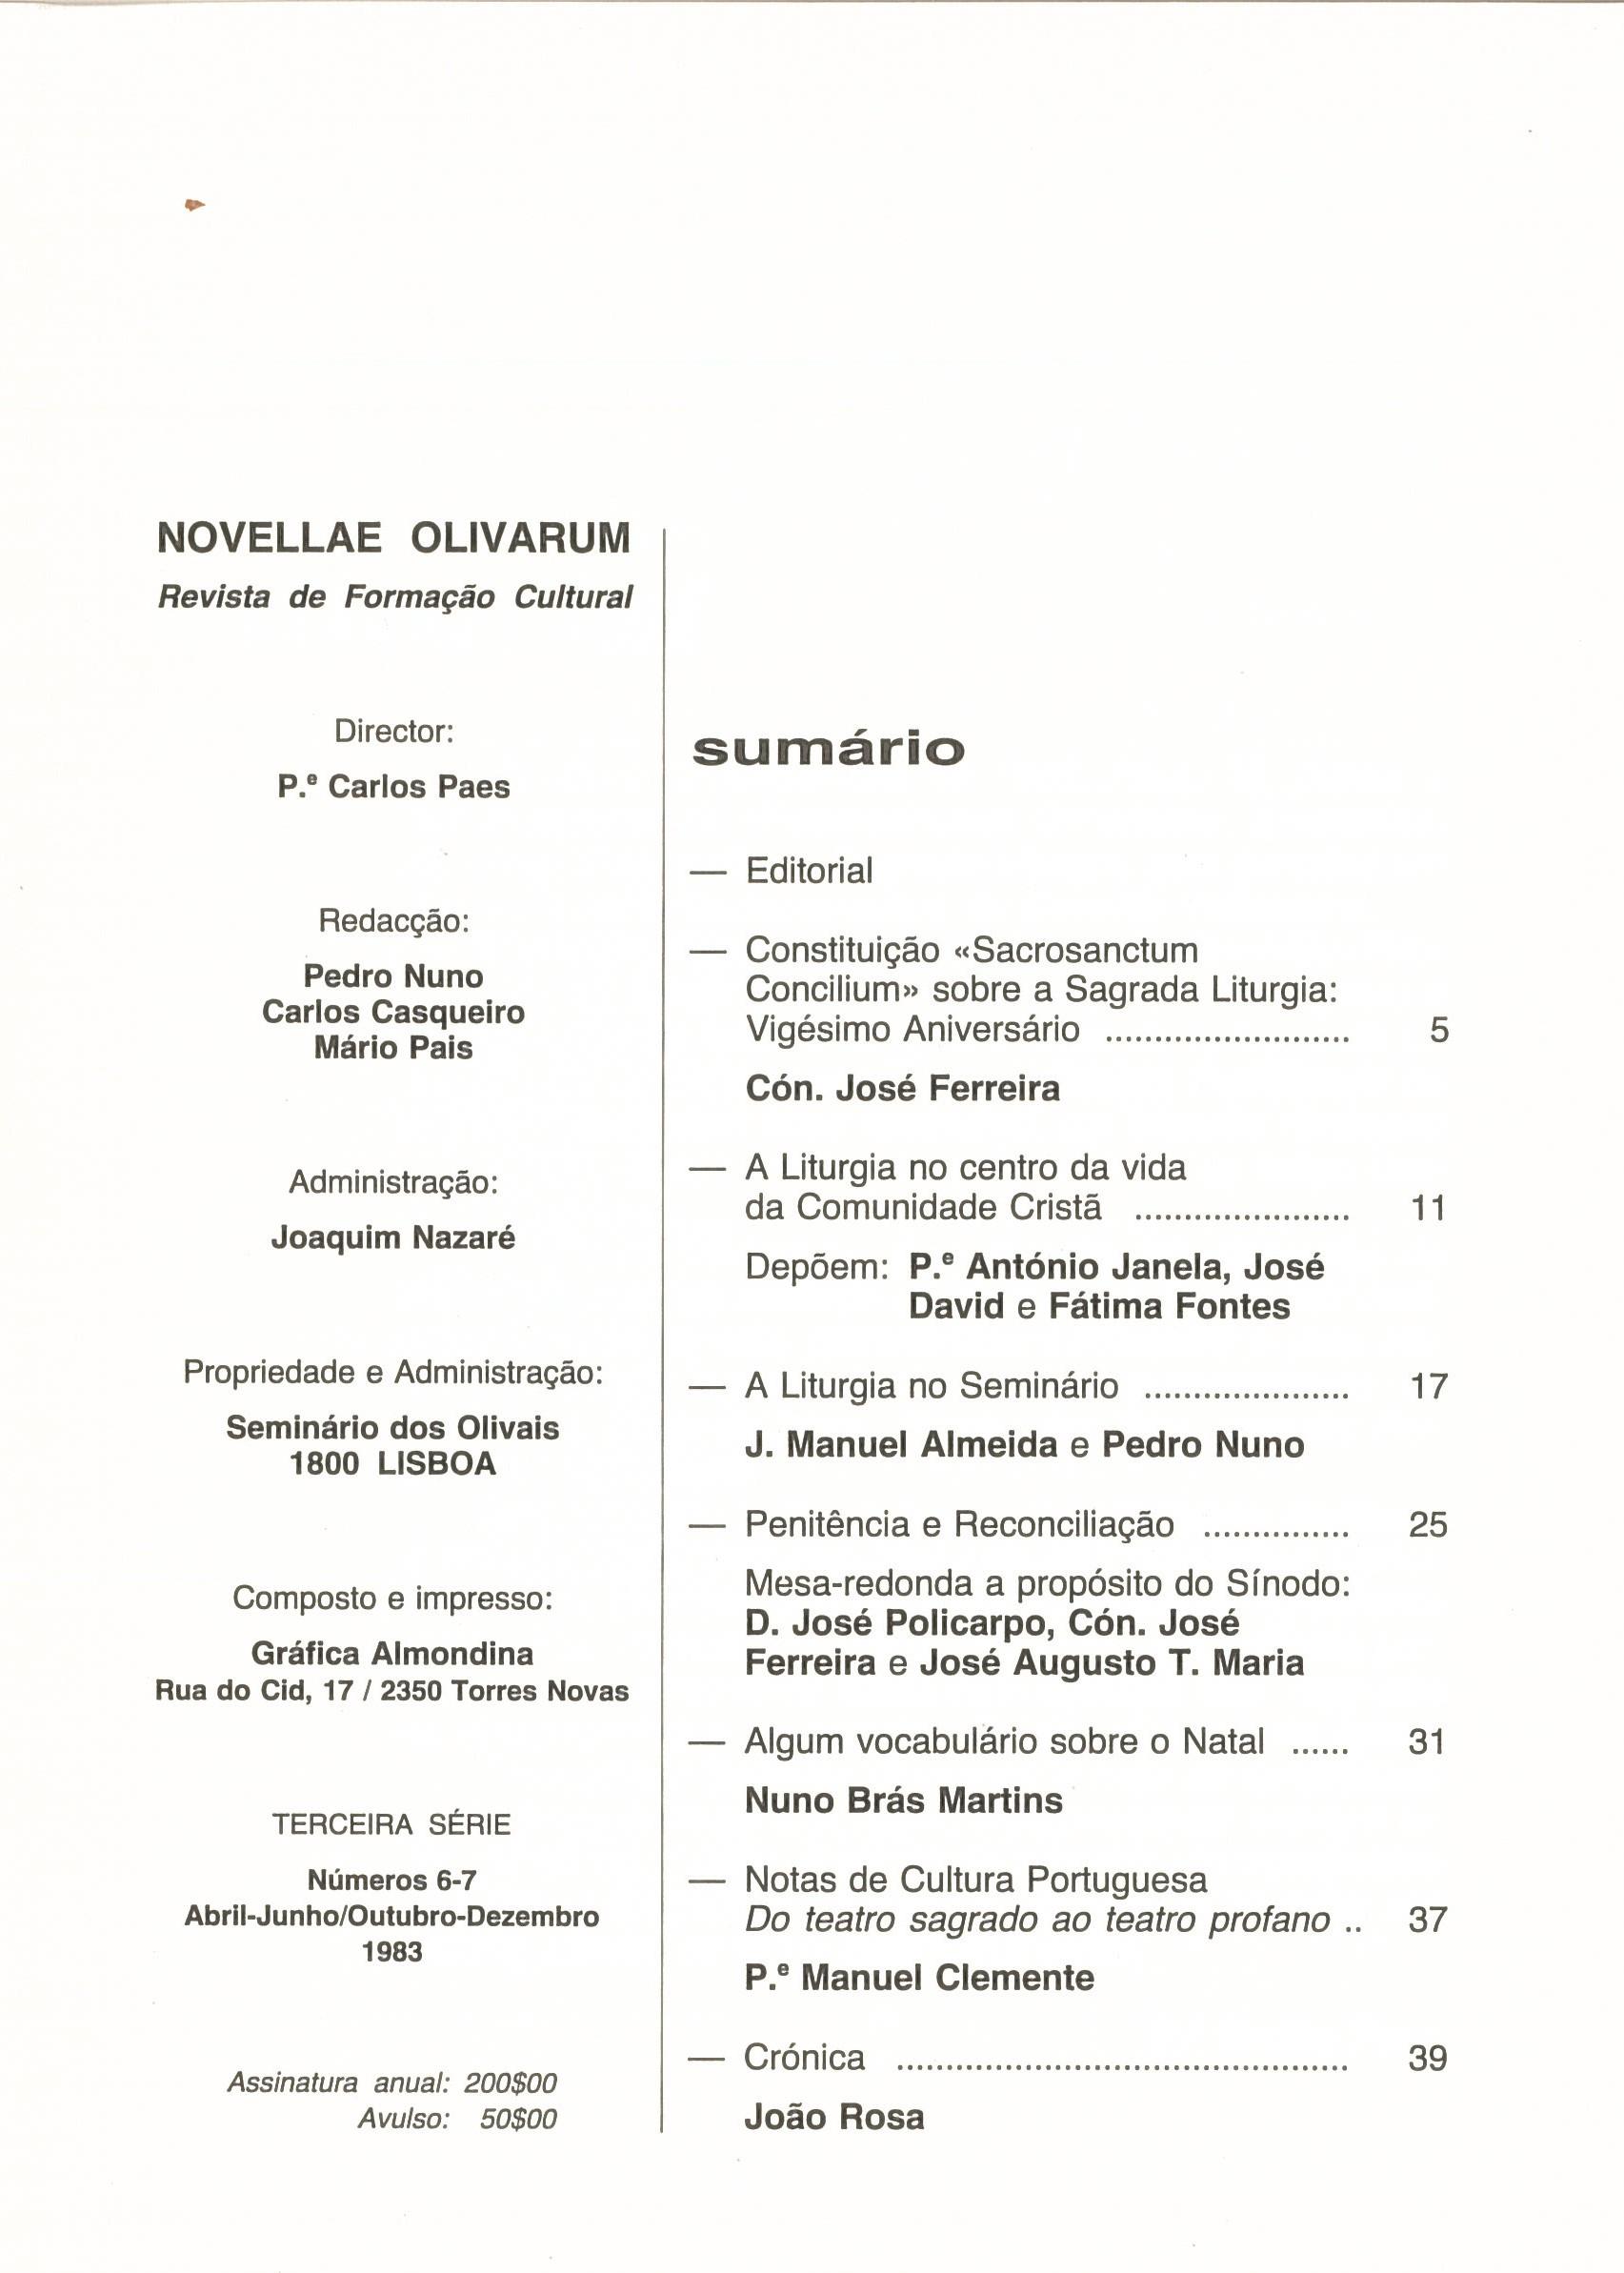 Revista Novellae Olivarum, nº 6 e 7 - Dezembro de 1983 (índice)